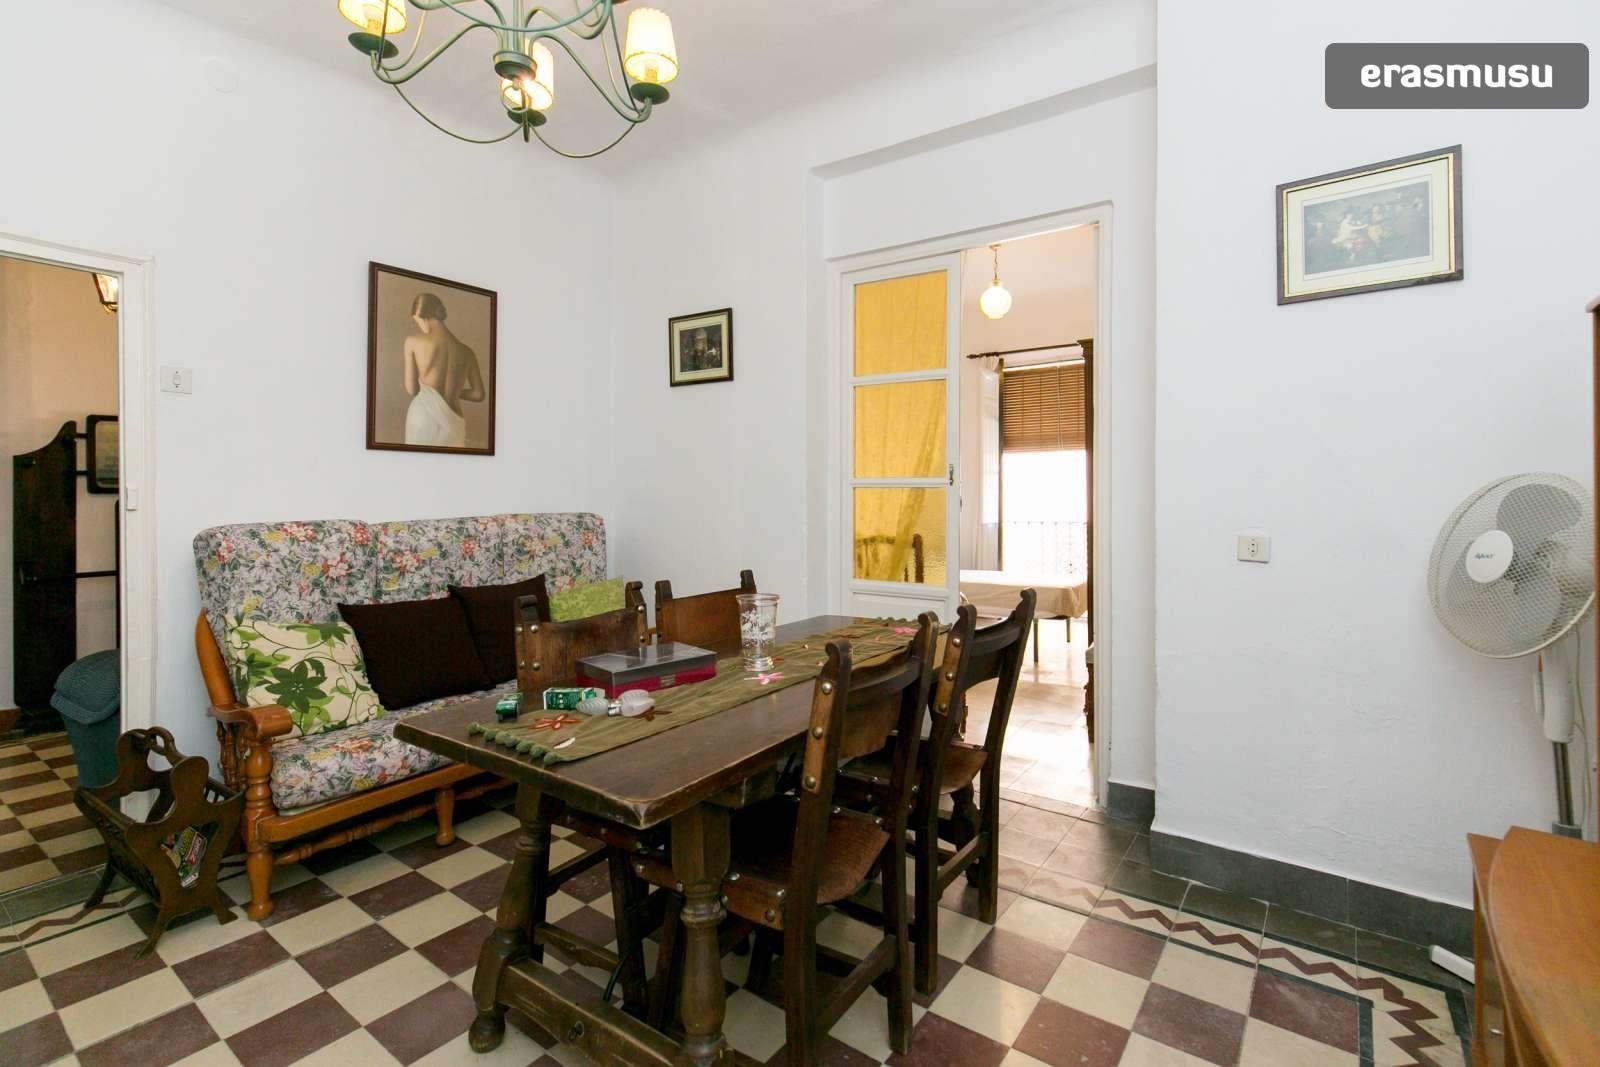 spacious-3-bedroom-apartment-rent-realejo-888d181294517c78ffeac1